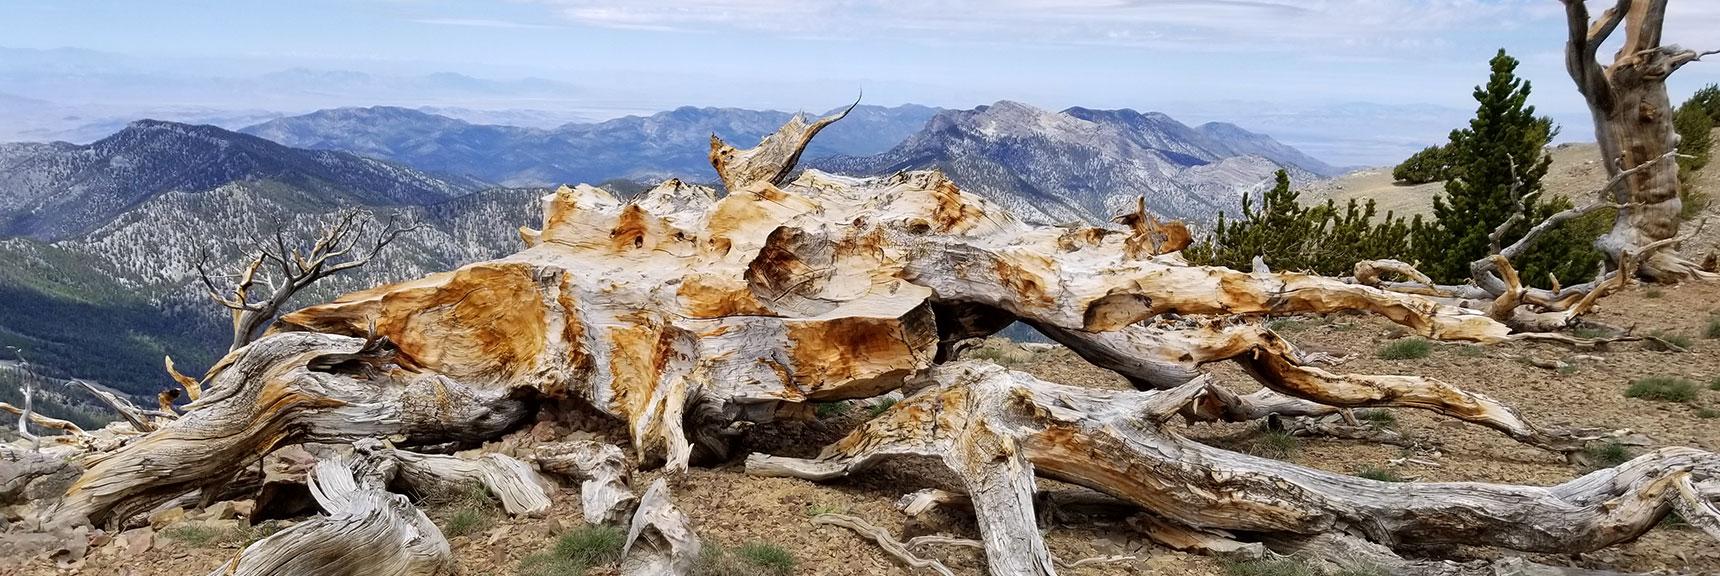 Fallen, Sun Bleached Bristlecone Pine on Mummy Mt. Summit